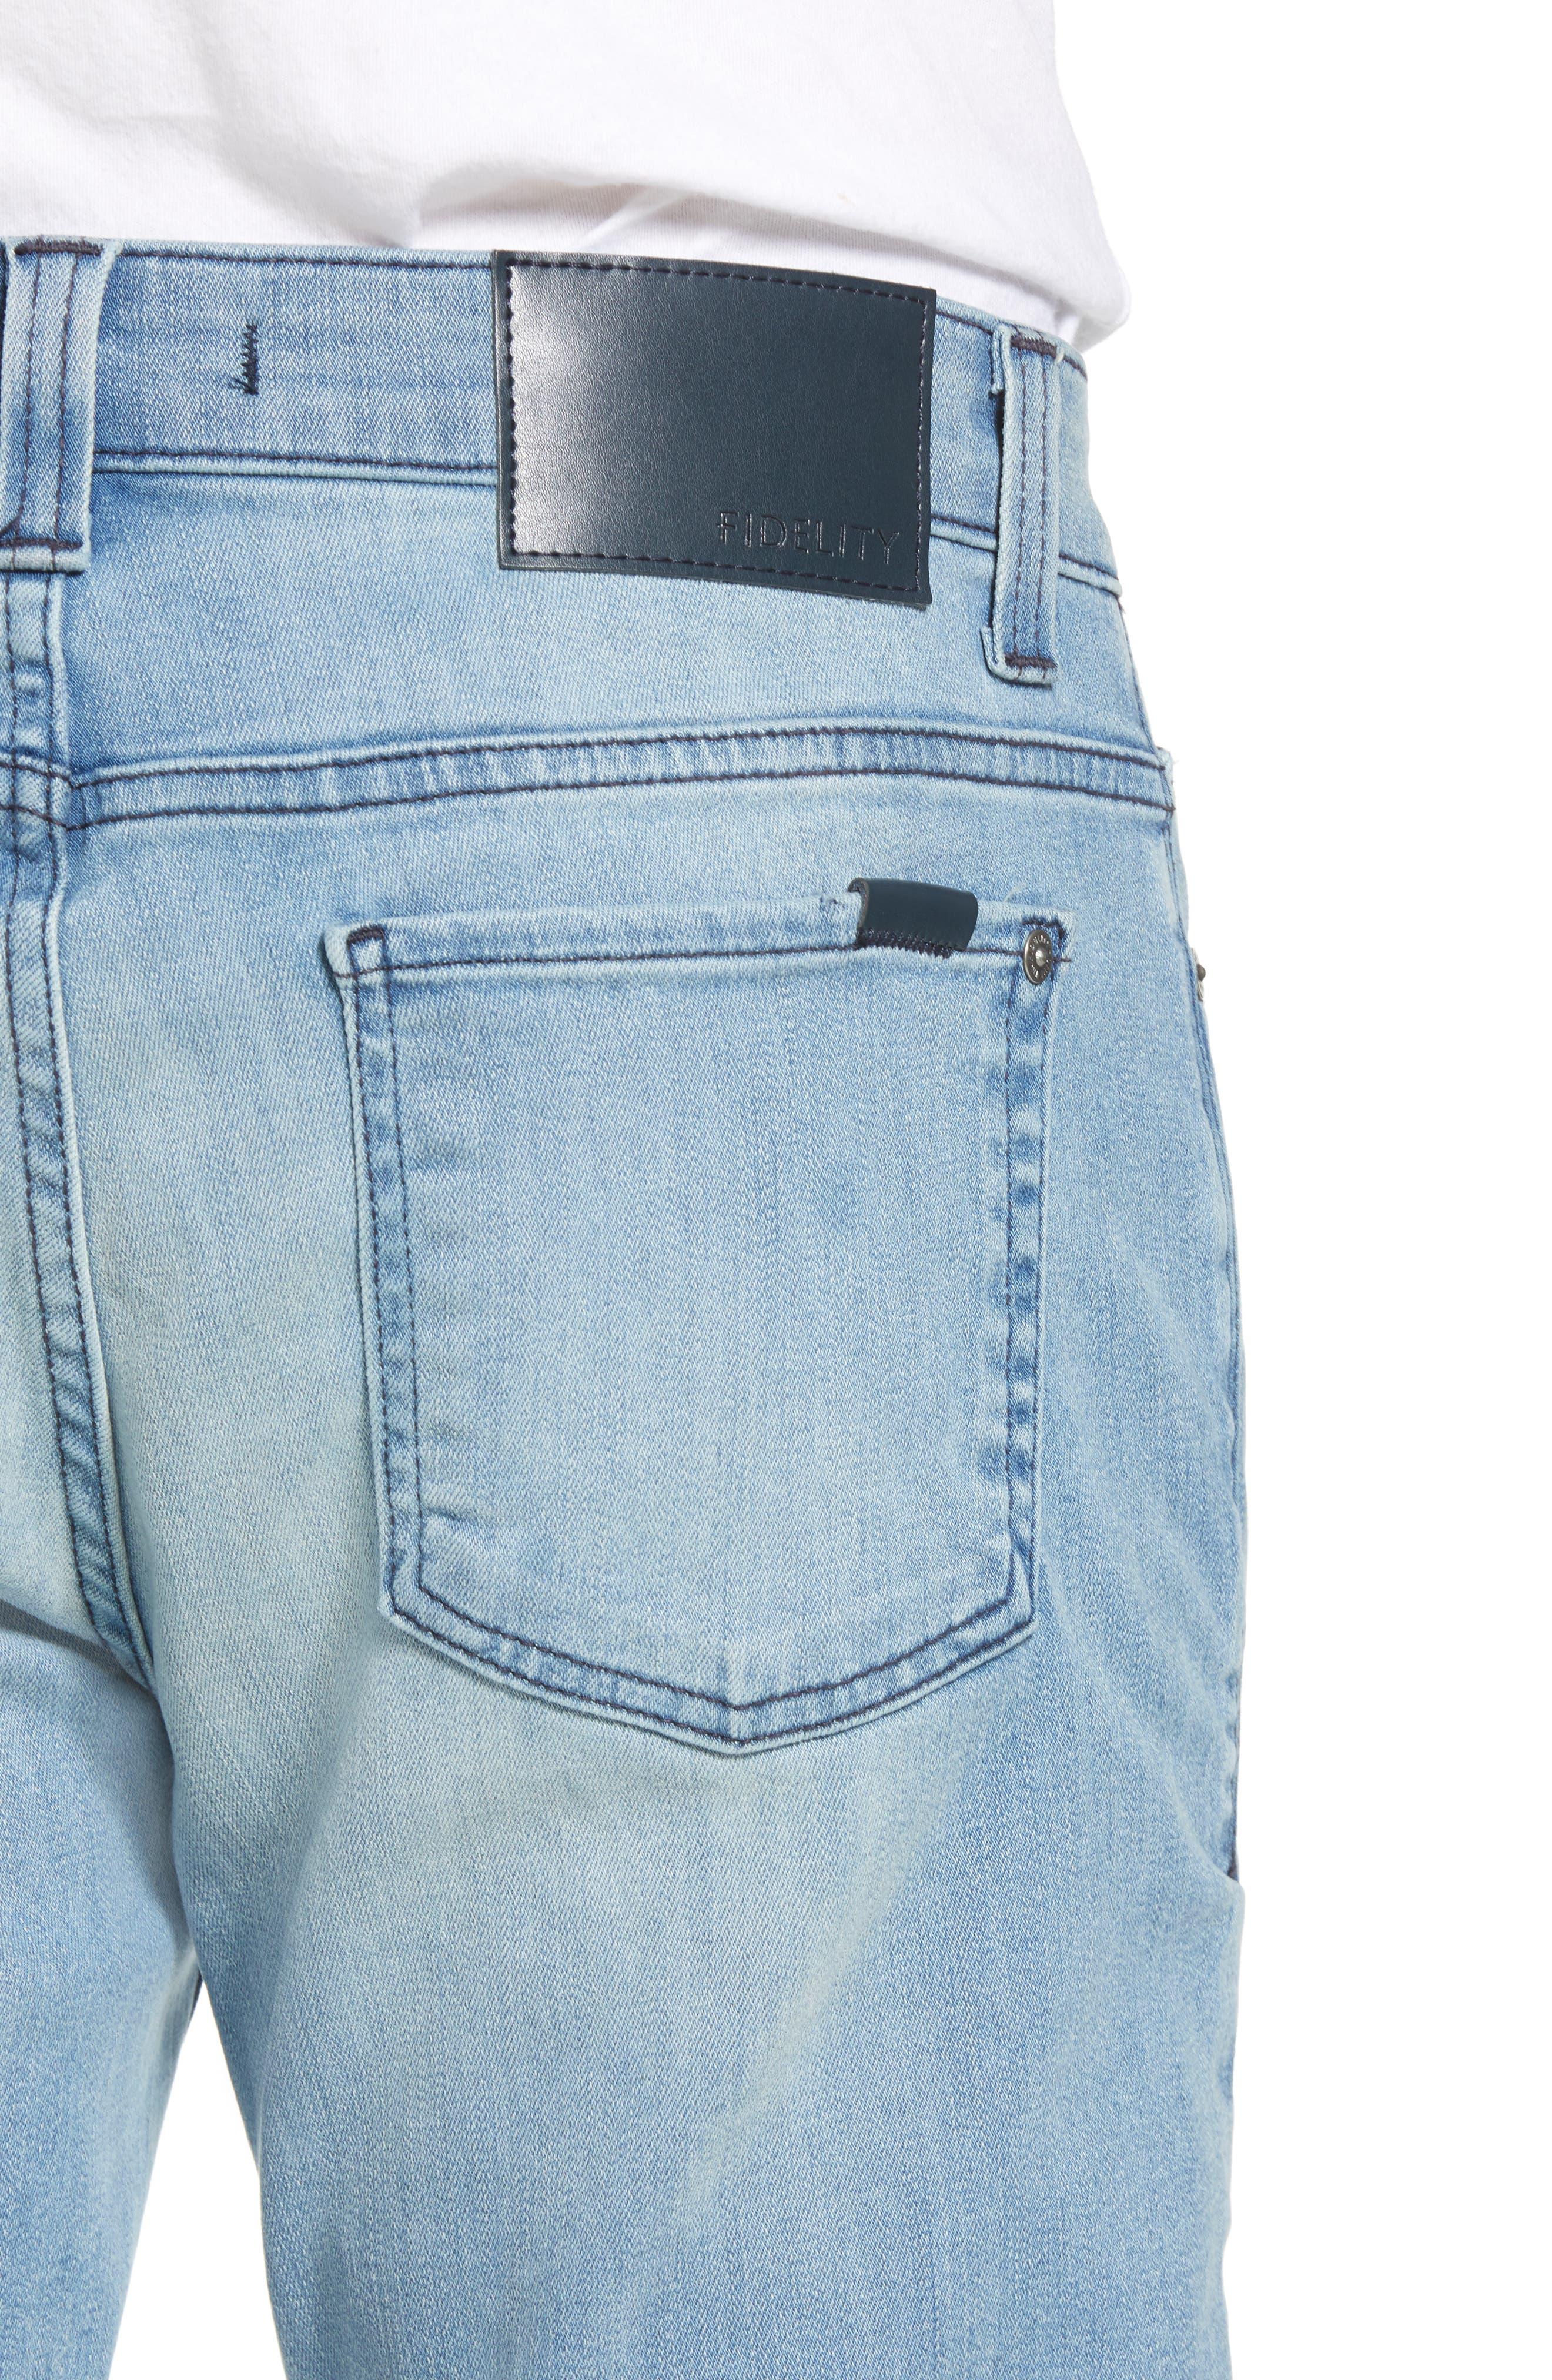 Torino Slim Fit Jeans,                             Alternate thumbnail 4, color,                             Abbey Blue